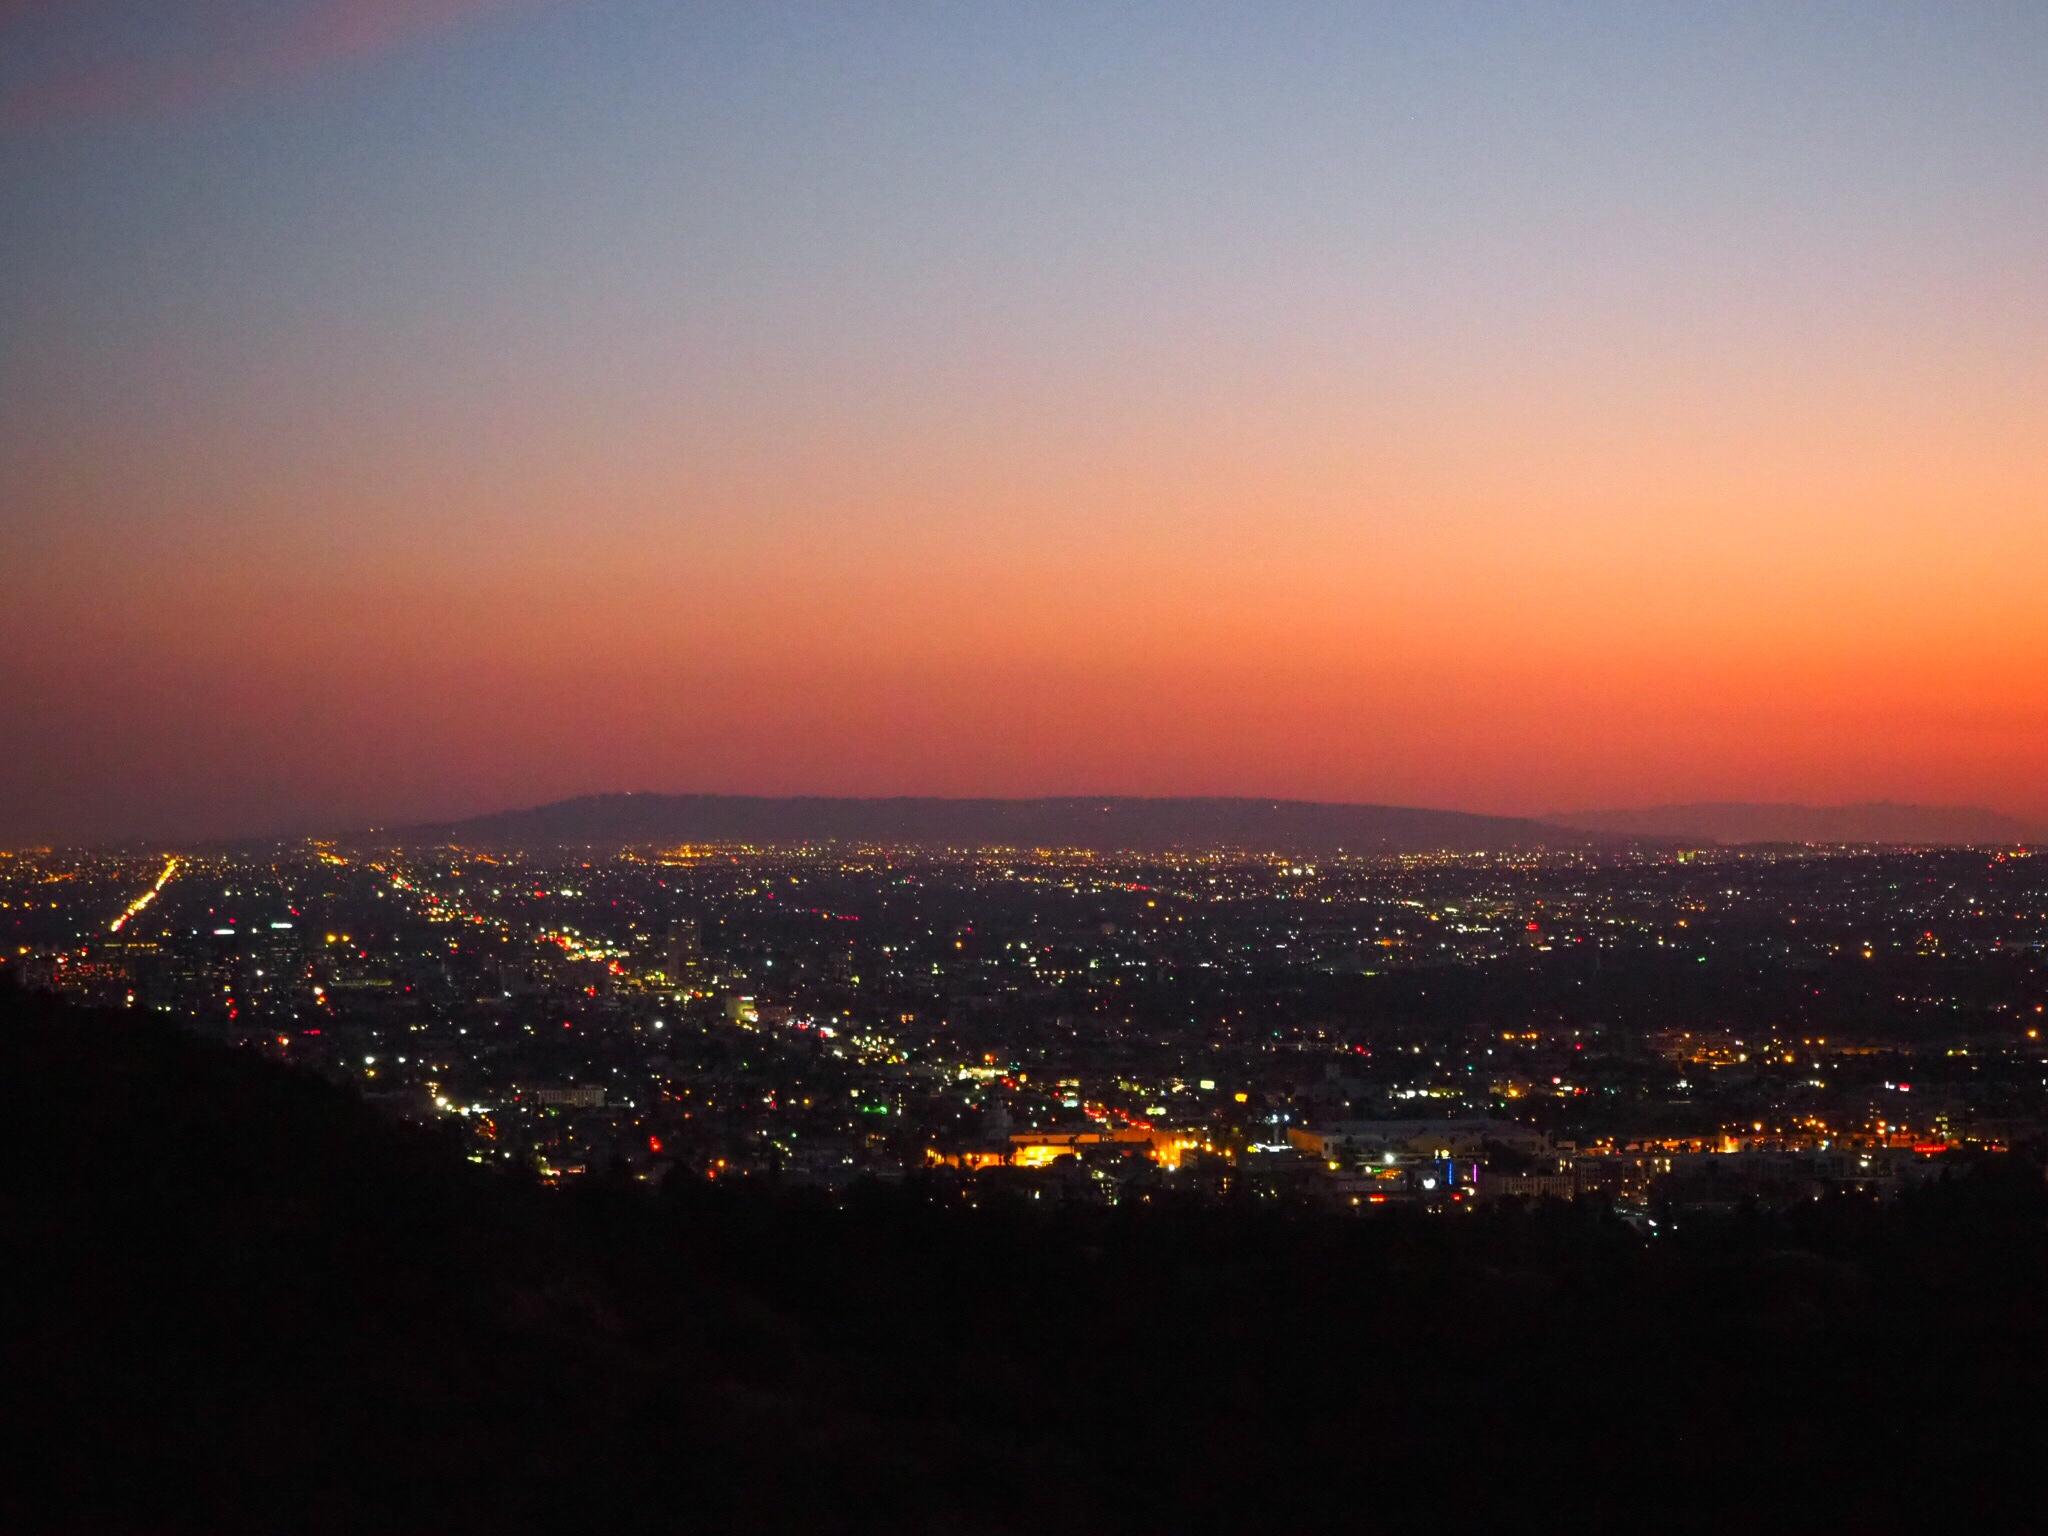 img 2363 - 24hours in LA - ロサンゼルスで過ごした24時間